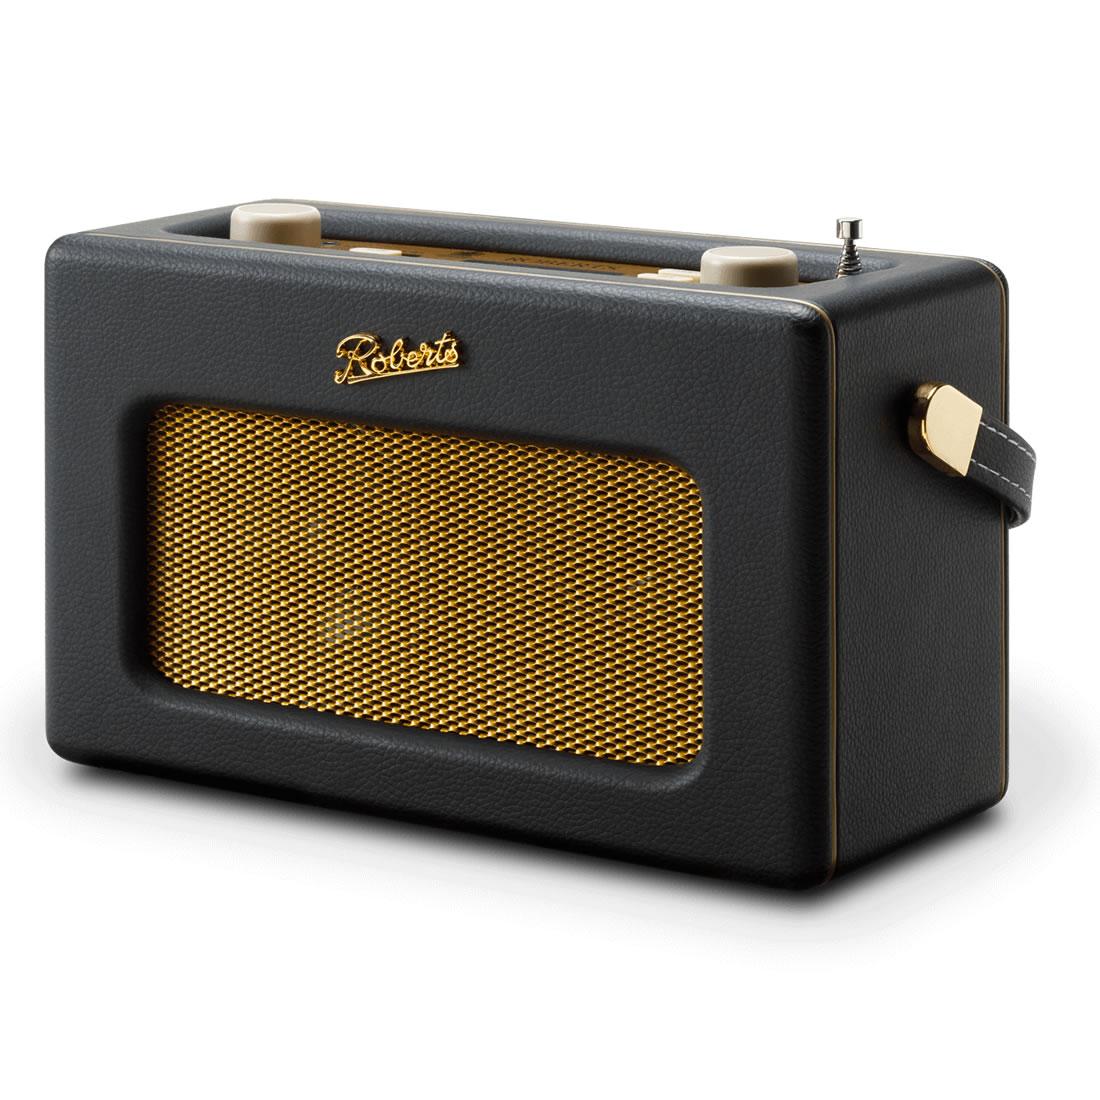 DAB/DAB+/FM RDS & WiFi Internet Radio Black